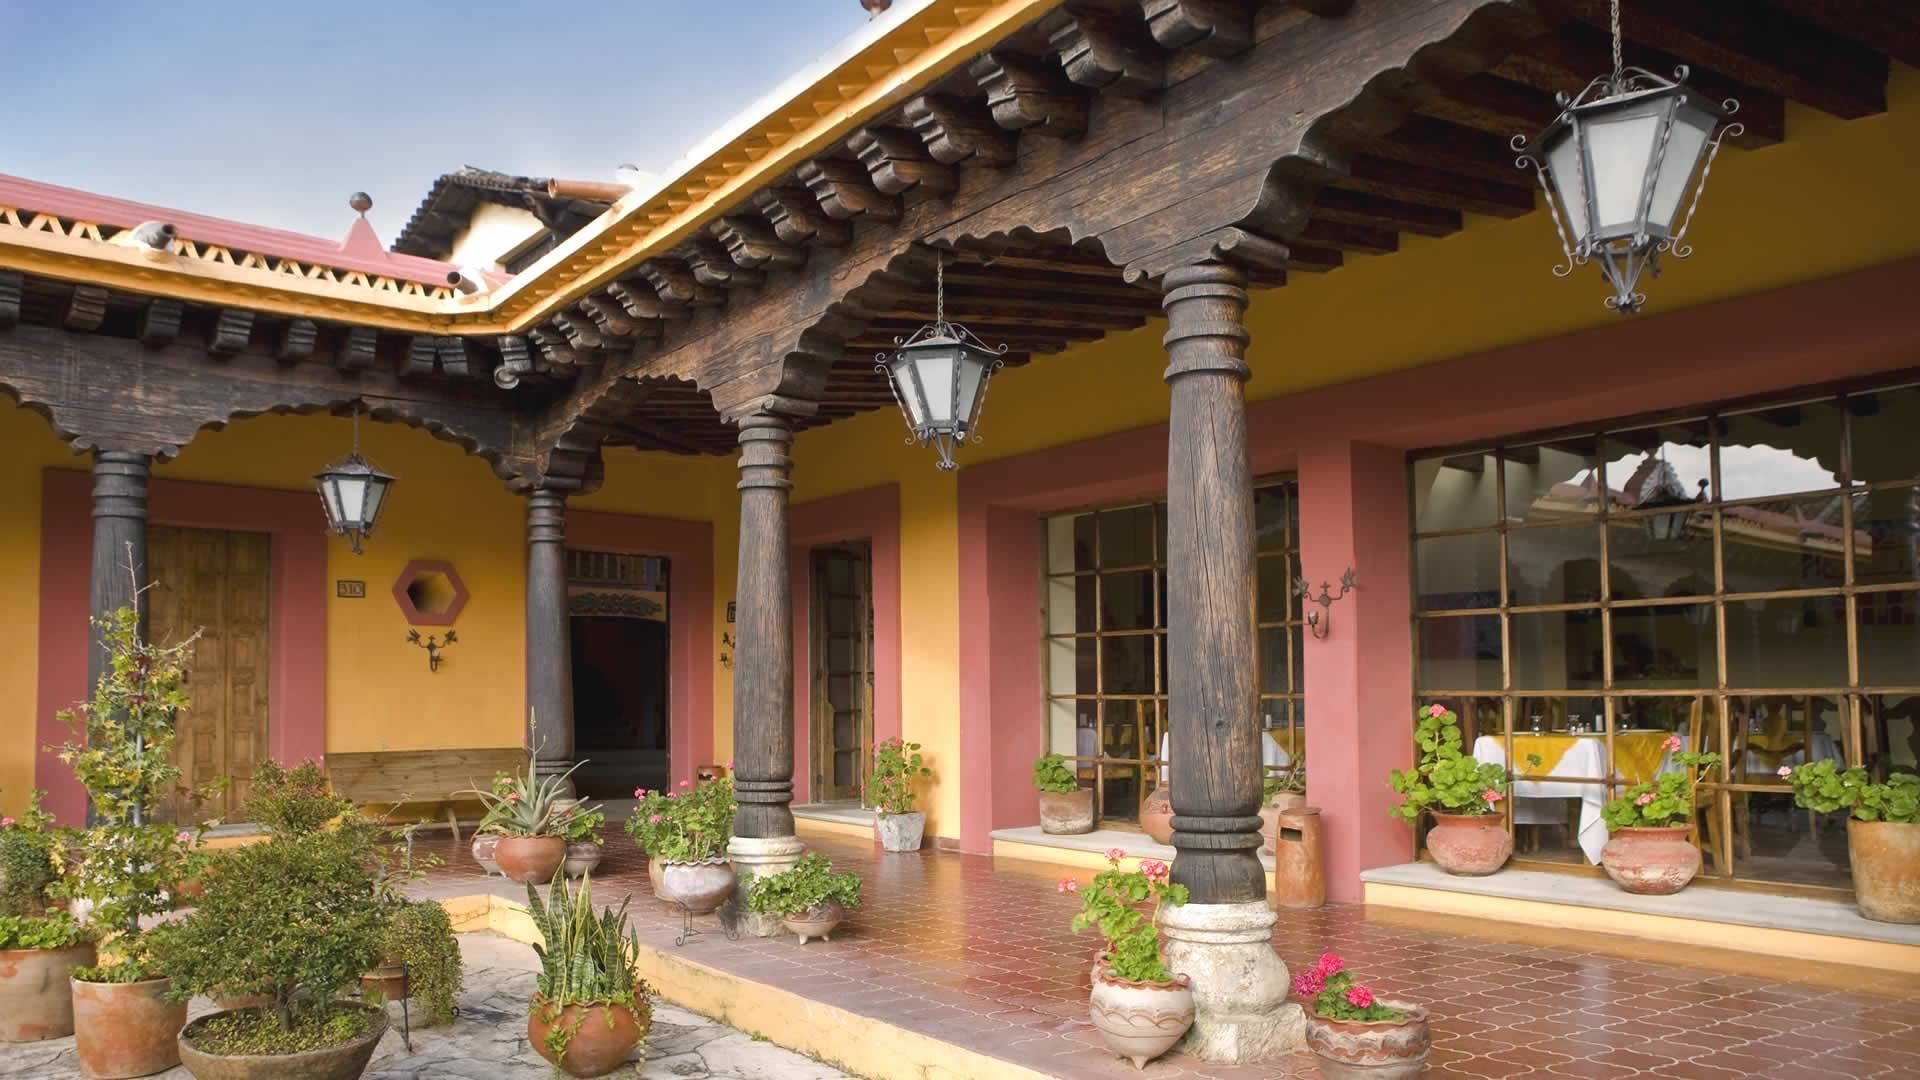 Hotel Catedral San Cristobal de las casas Chiapas Mx